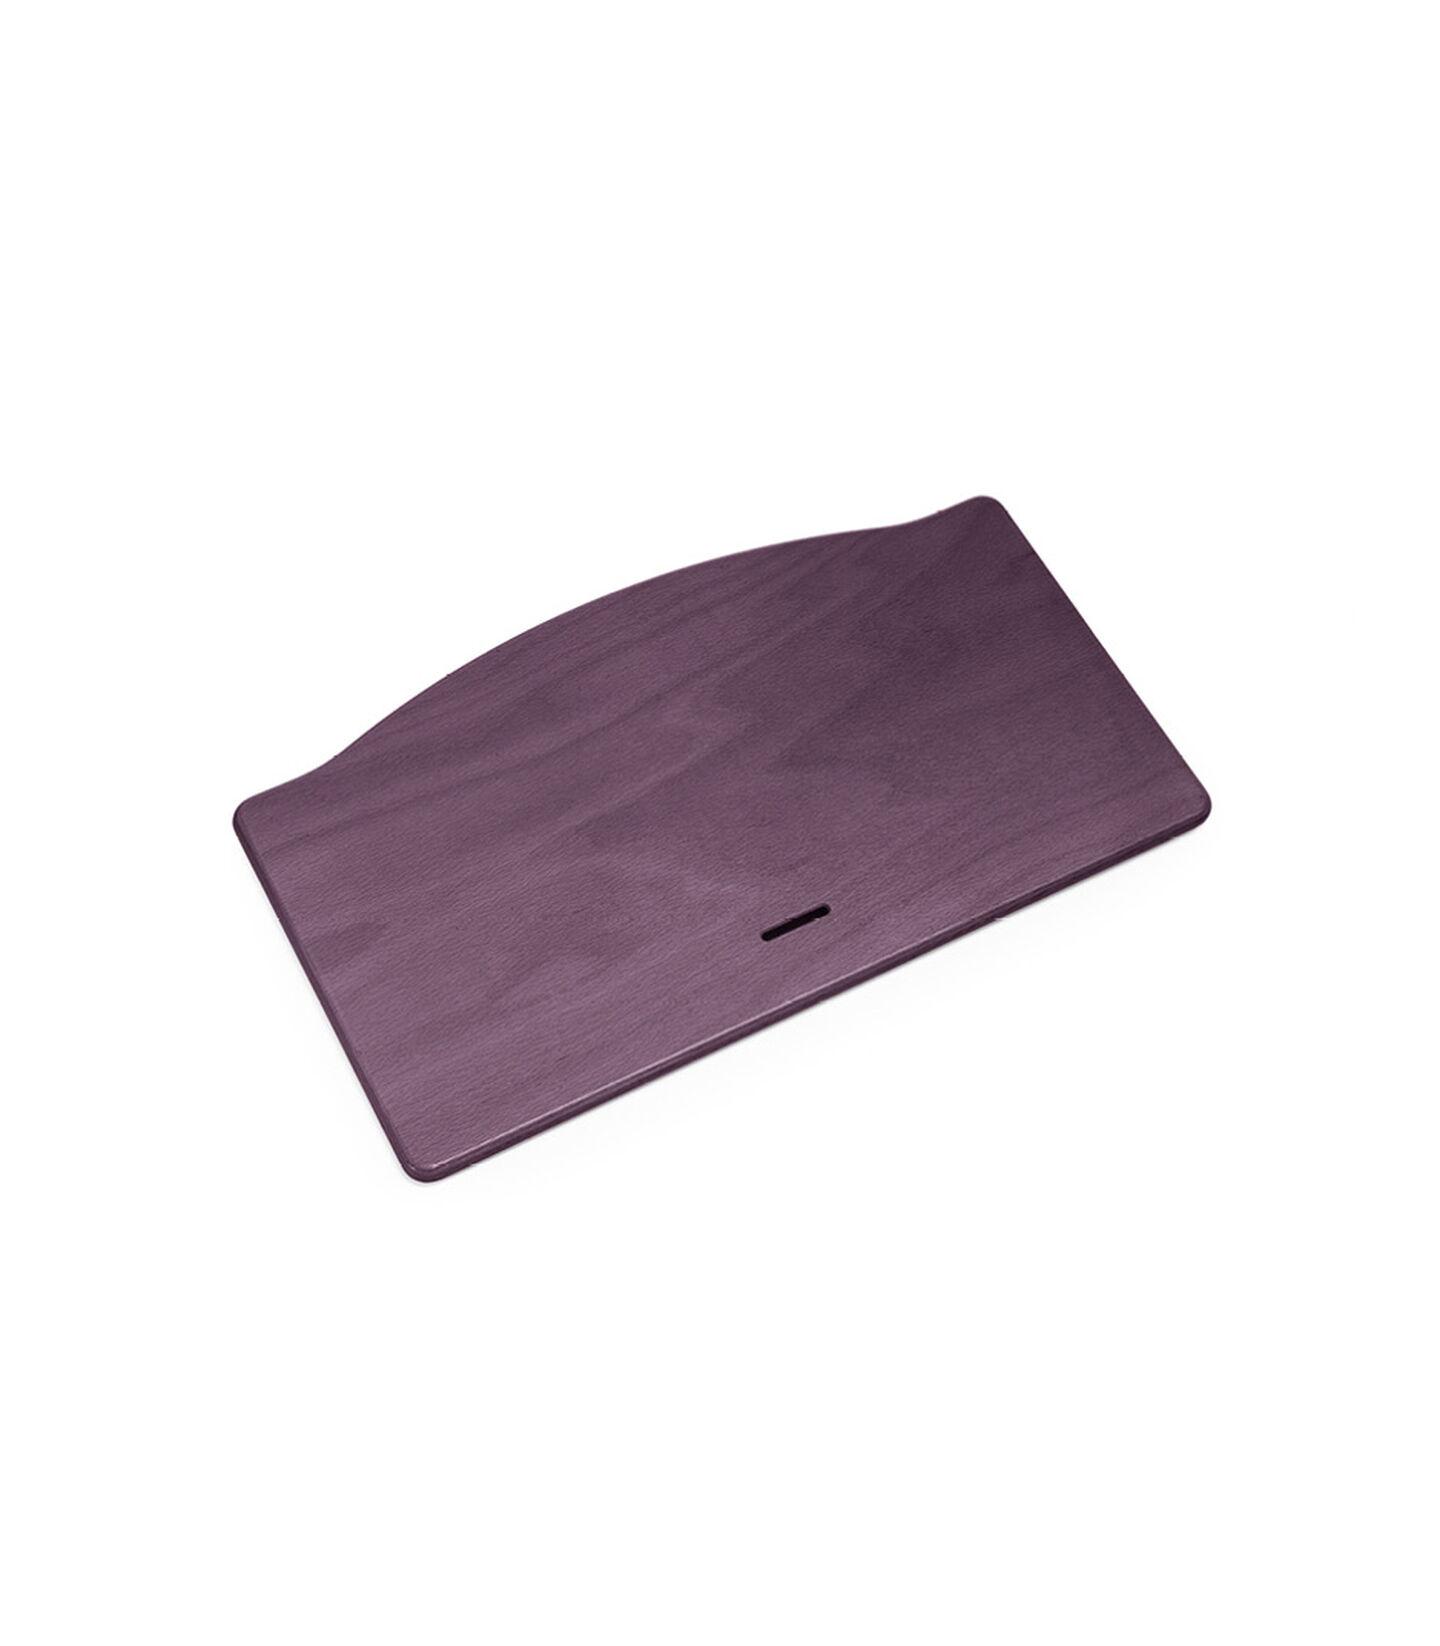 Tripp Trapp® Seatplate Plum Purple, Prugna, mainview